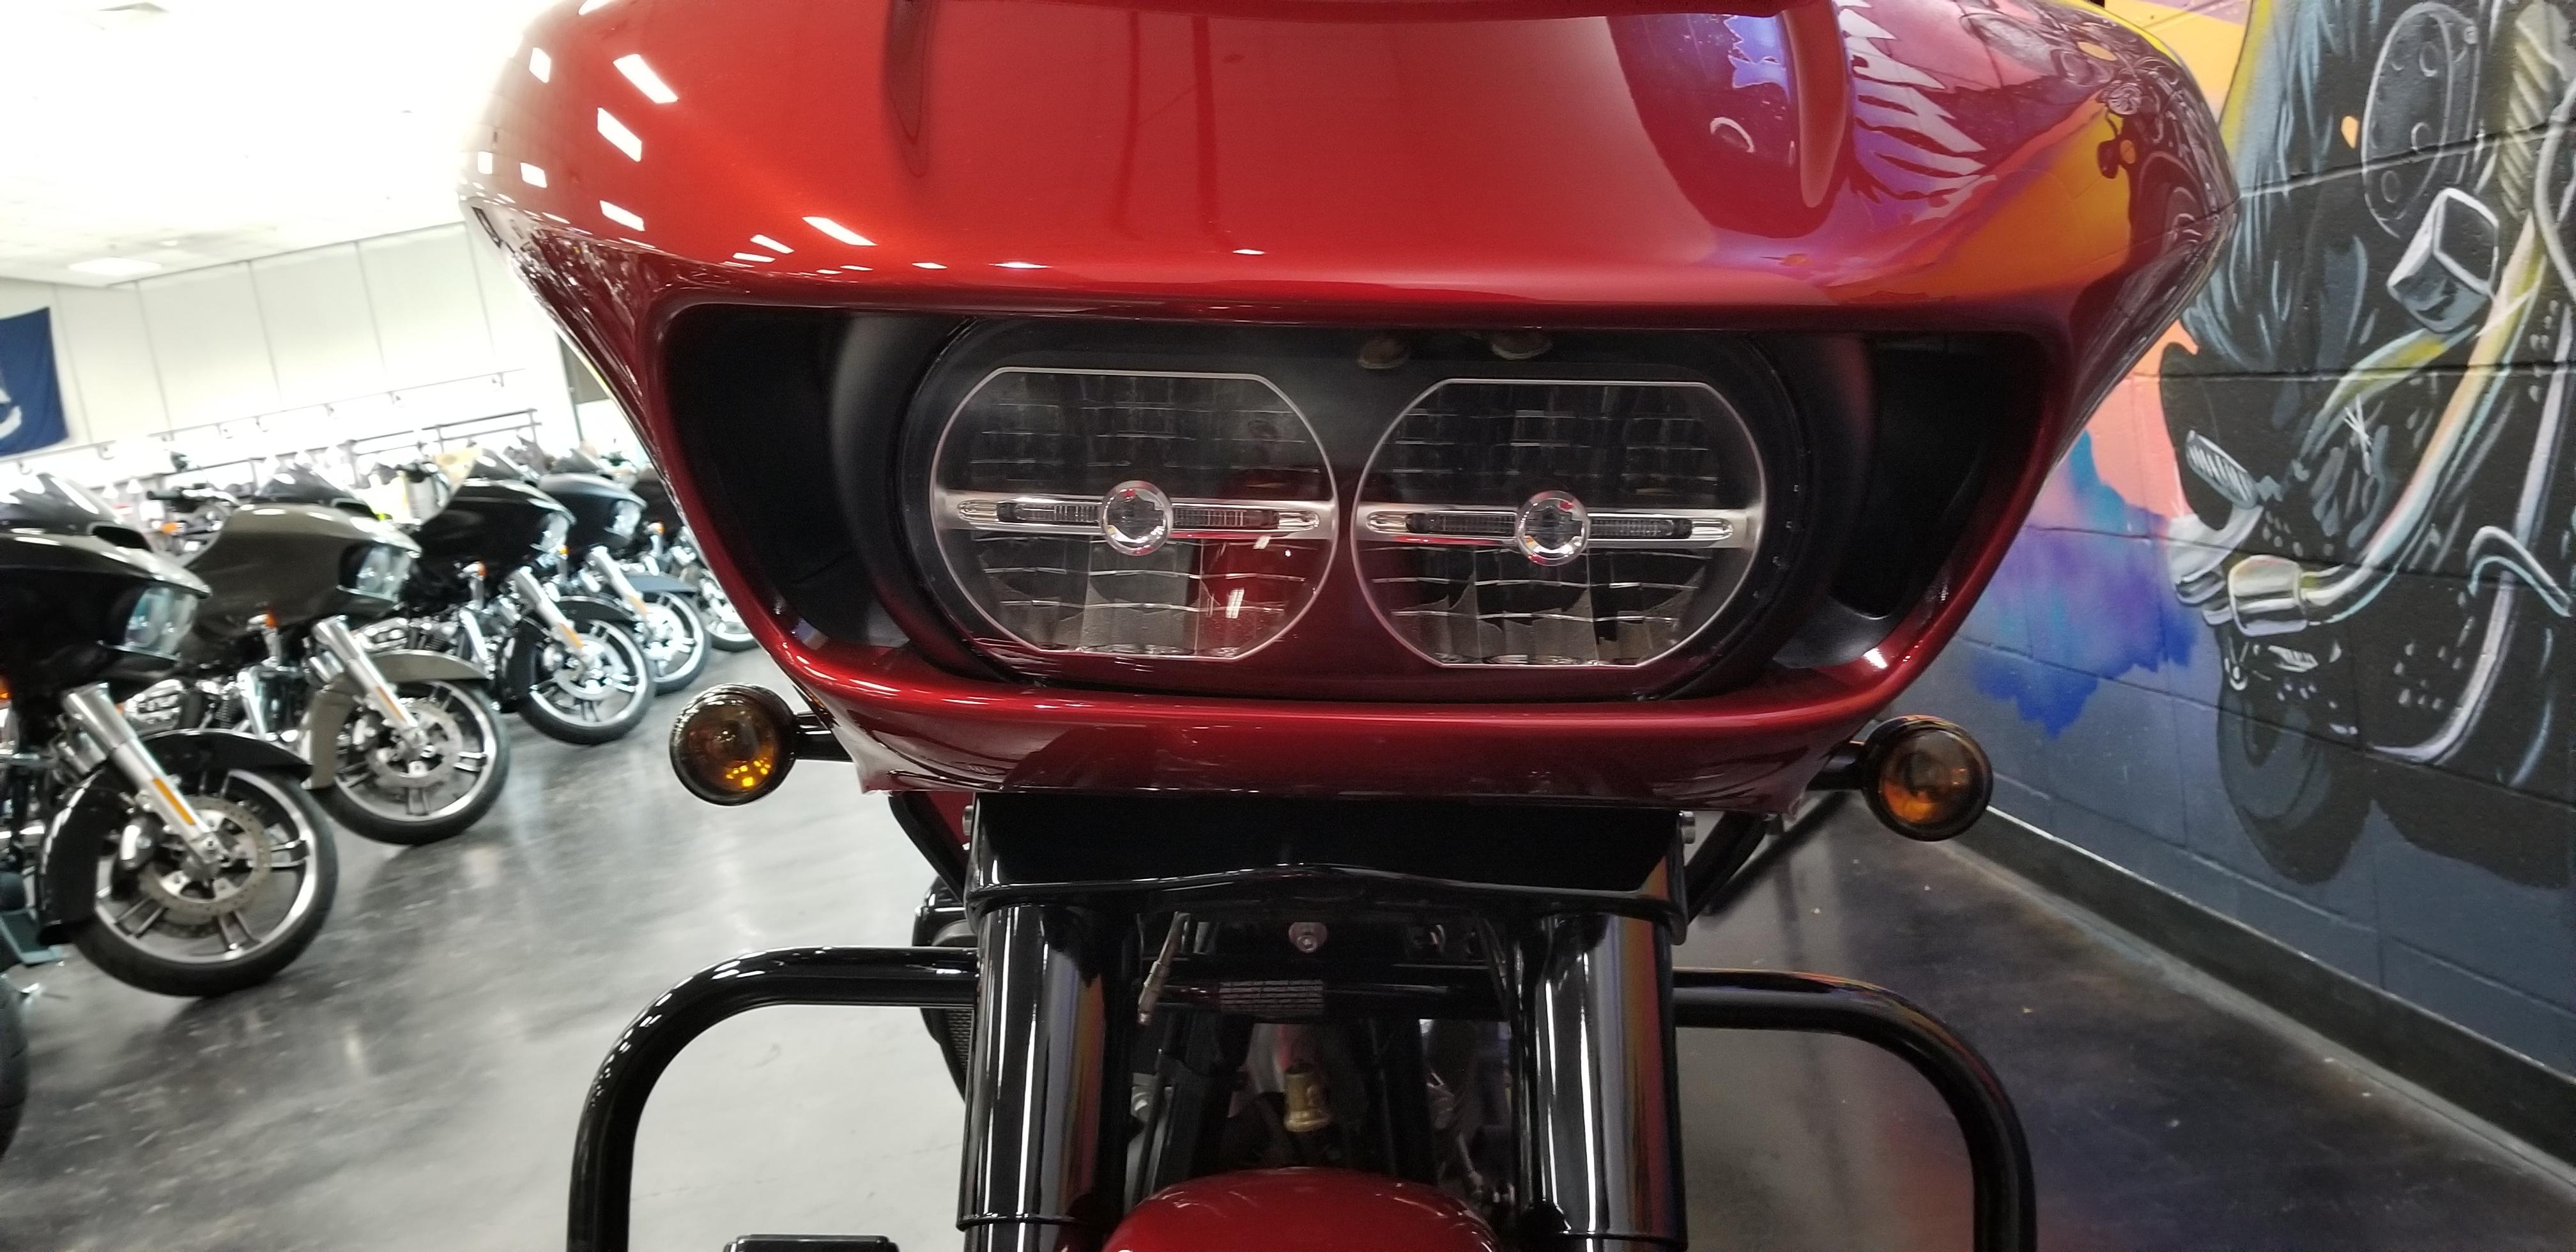 Pre-Owned 2018 Harley-Davidson Road Glide Special FLTRXS